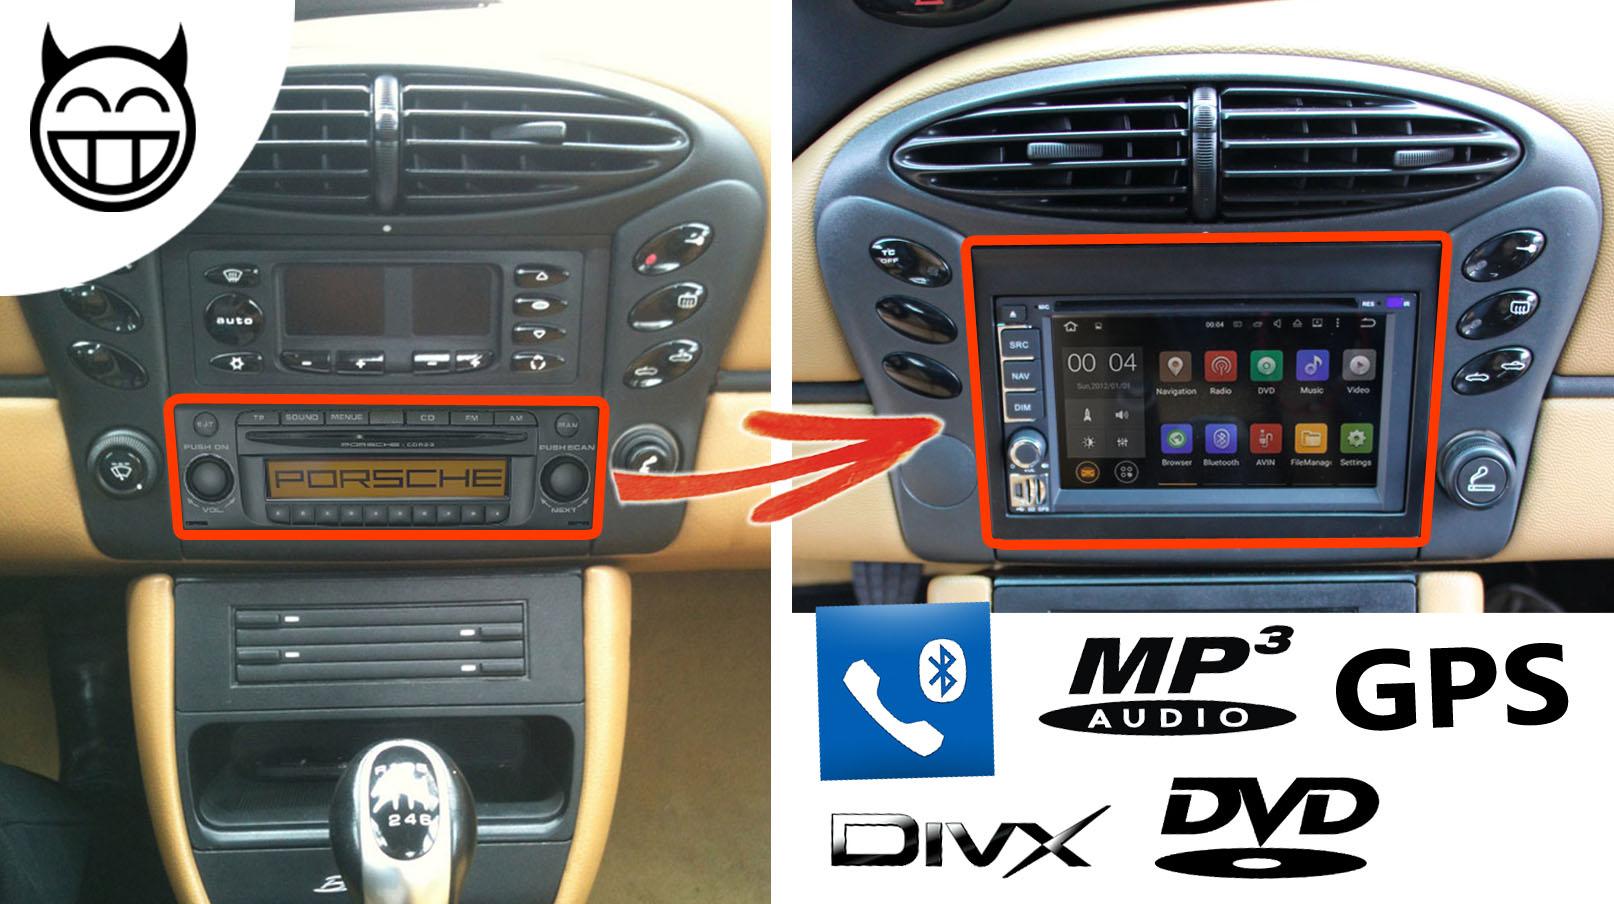 Boxster autoradio Android MP3 GPS